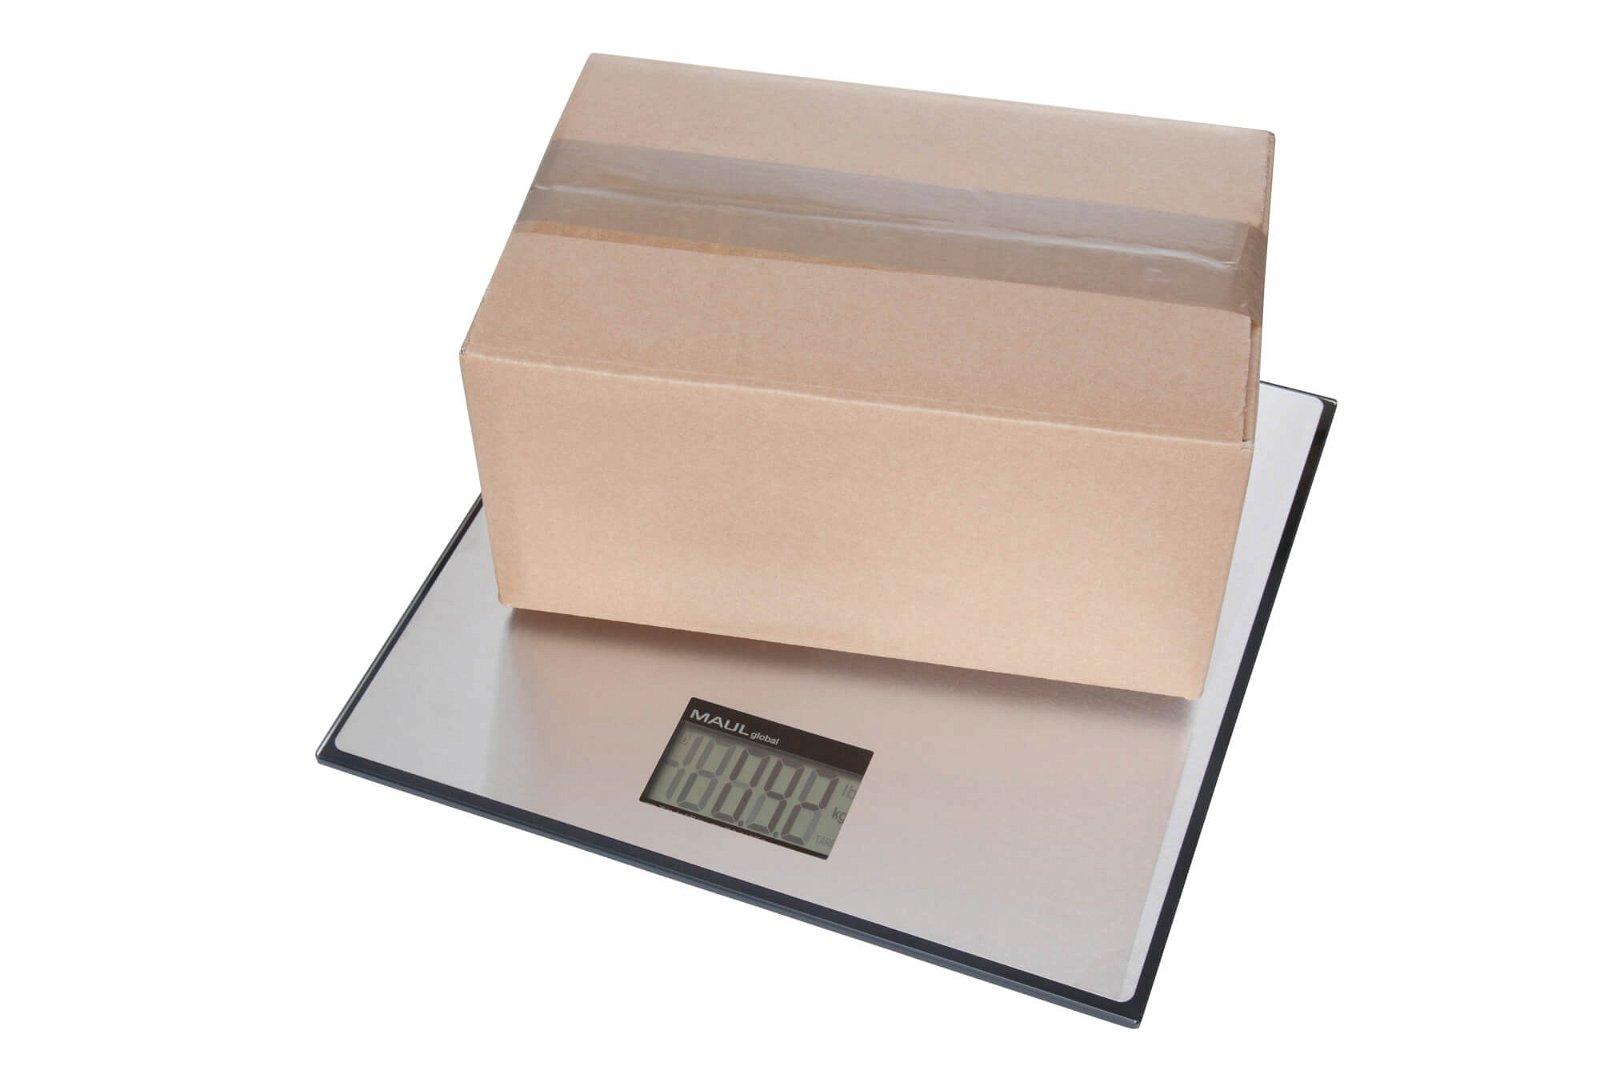 Paketwaage MAULglobal, 50 kg, schwarz